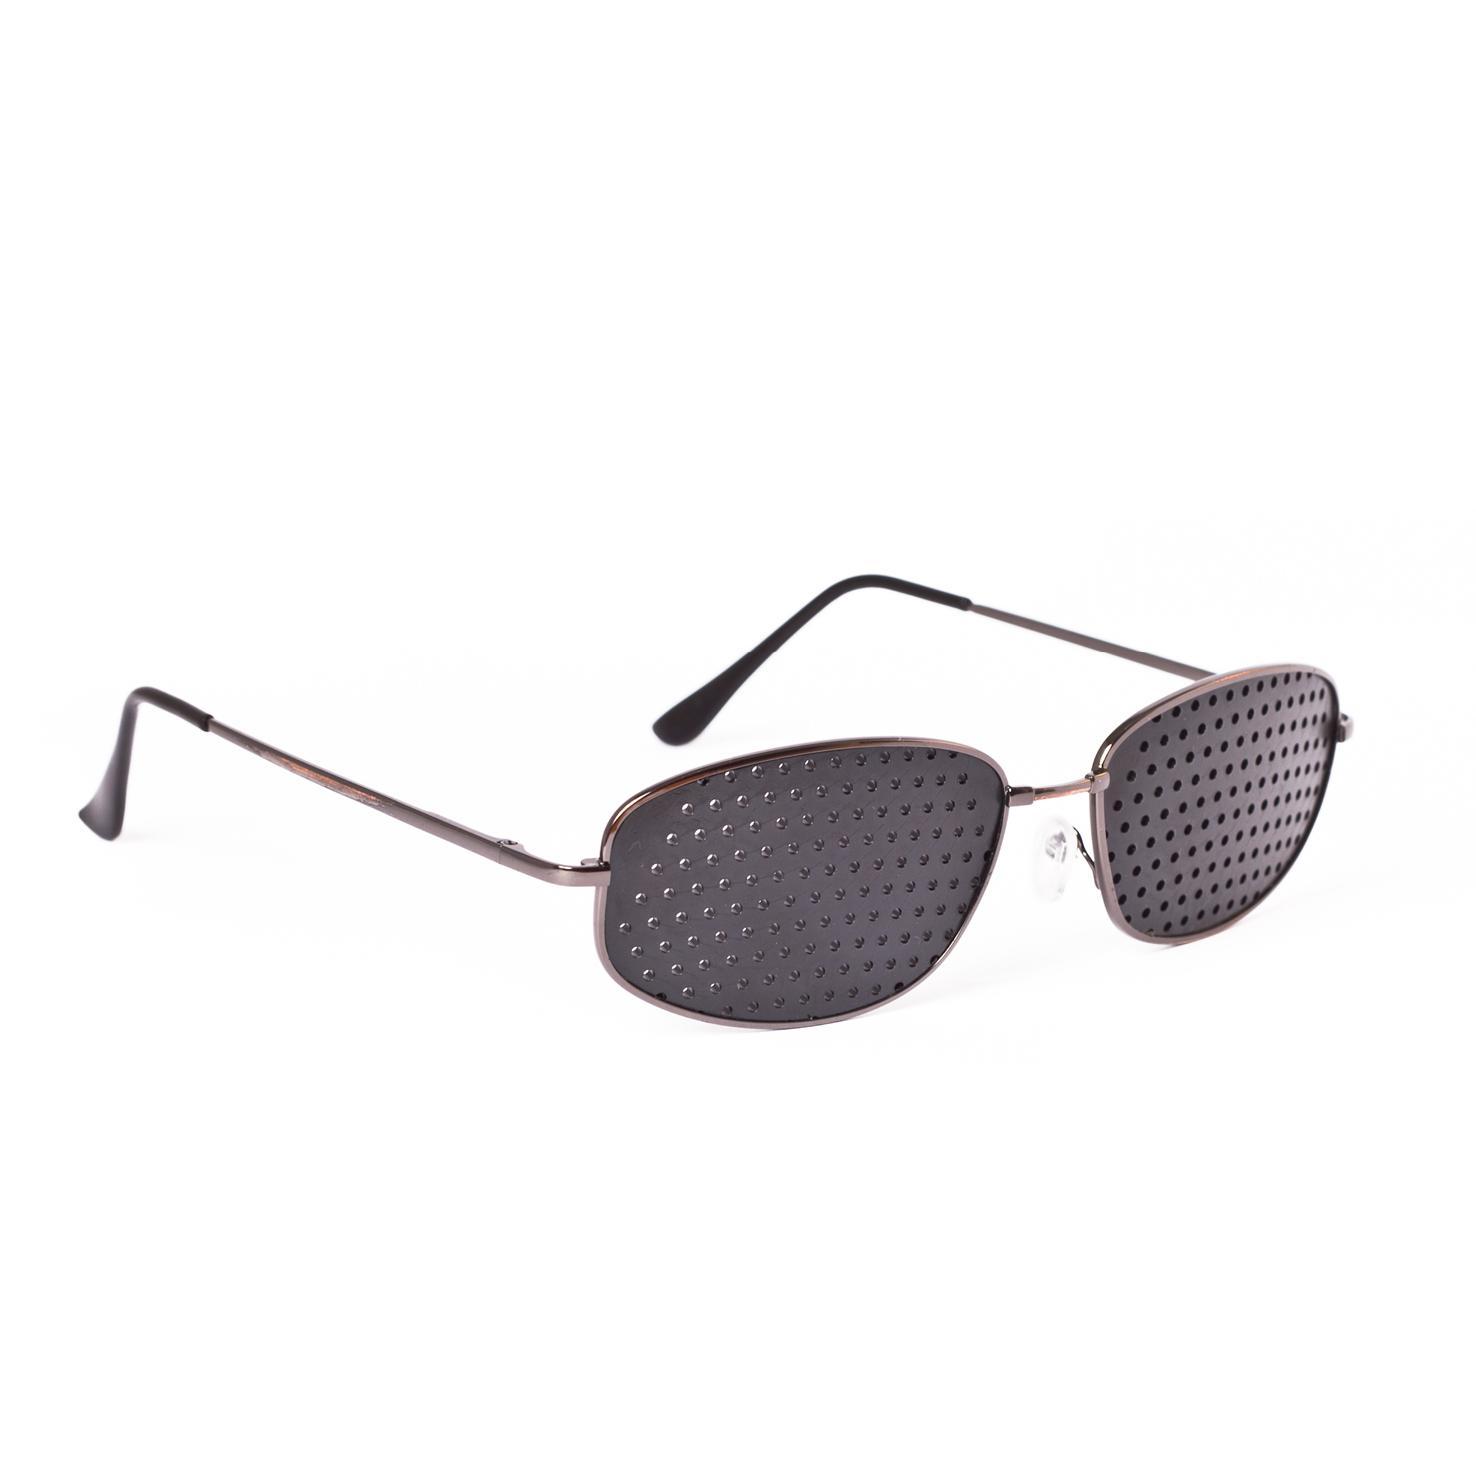 Irisana Gafas Reticulares Metal 1Ud 200 g